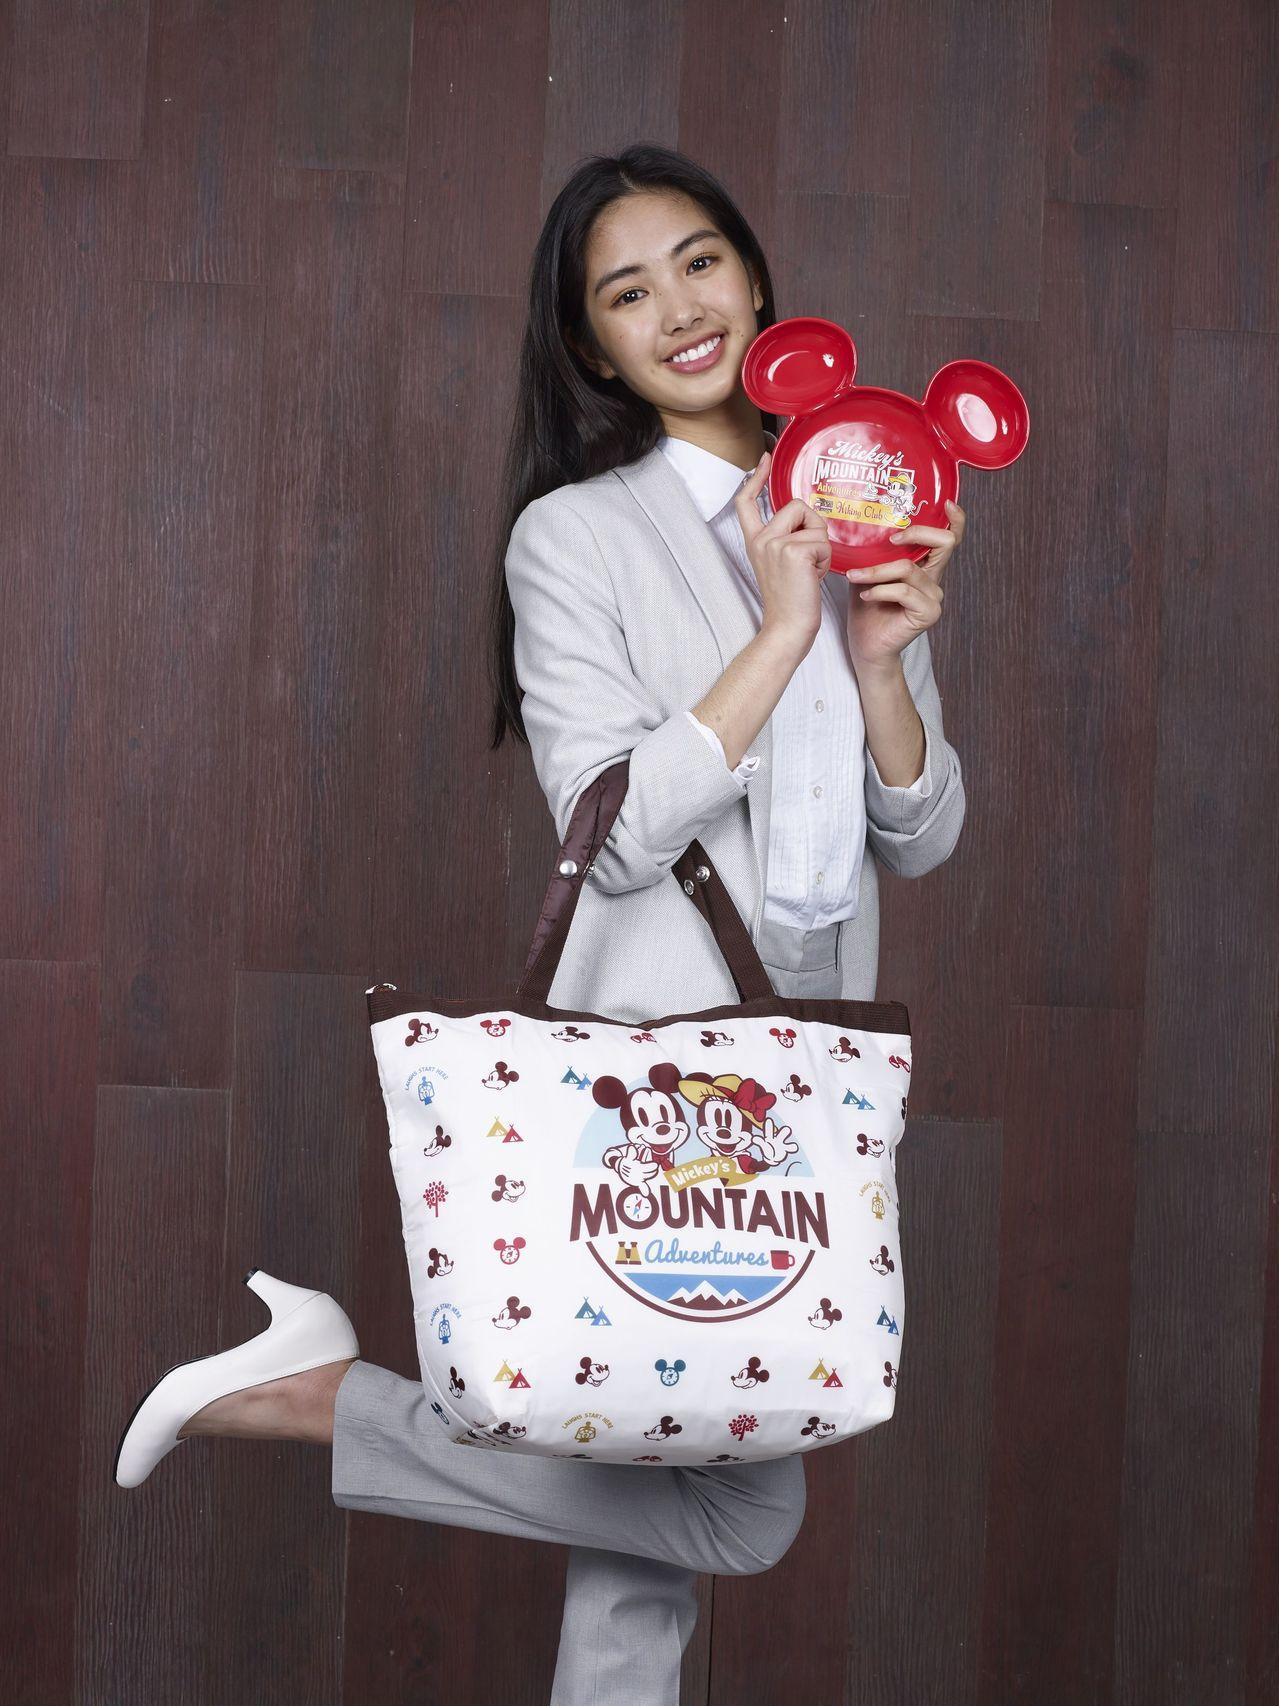 7-ELEVEN將於4月24日起推出「迪士尼夢幻露營」全店集點共二波活動。圖/7...